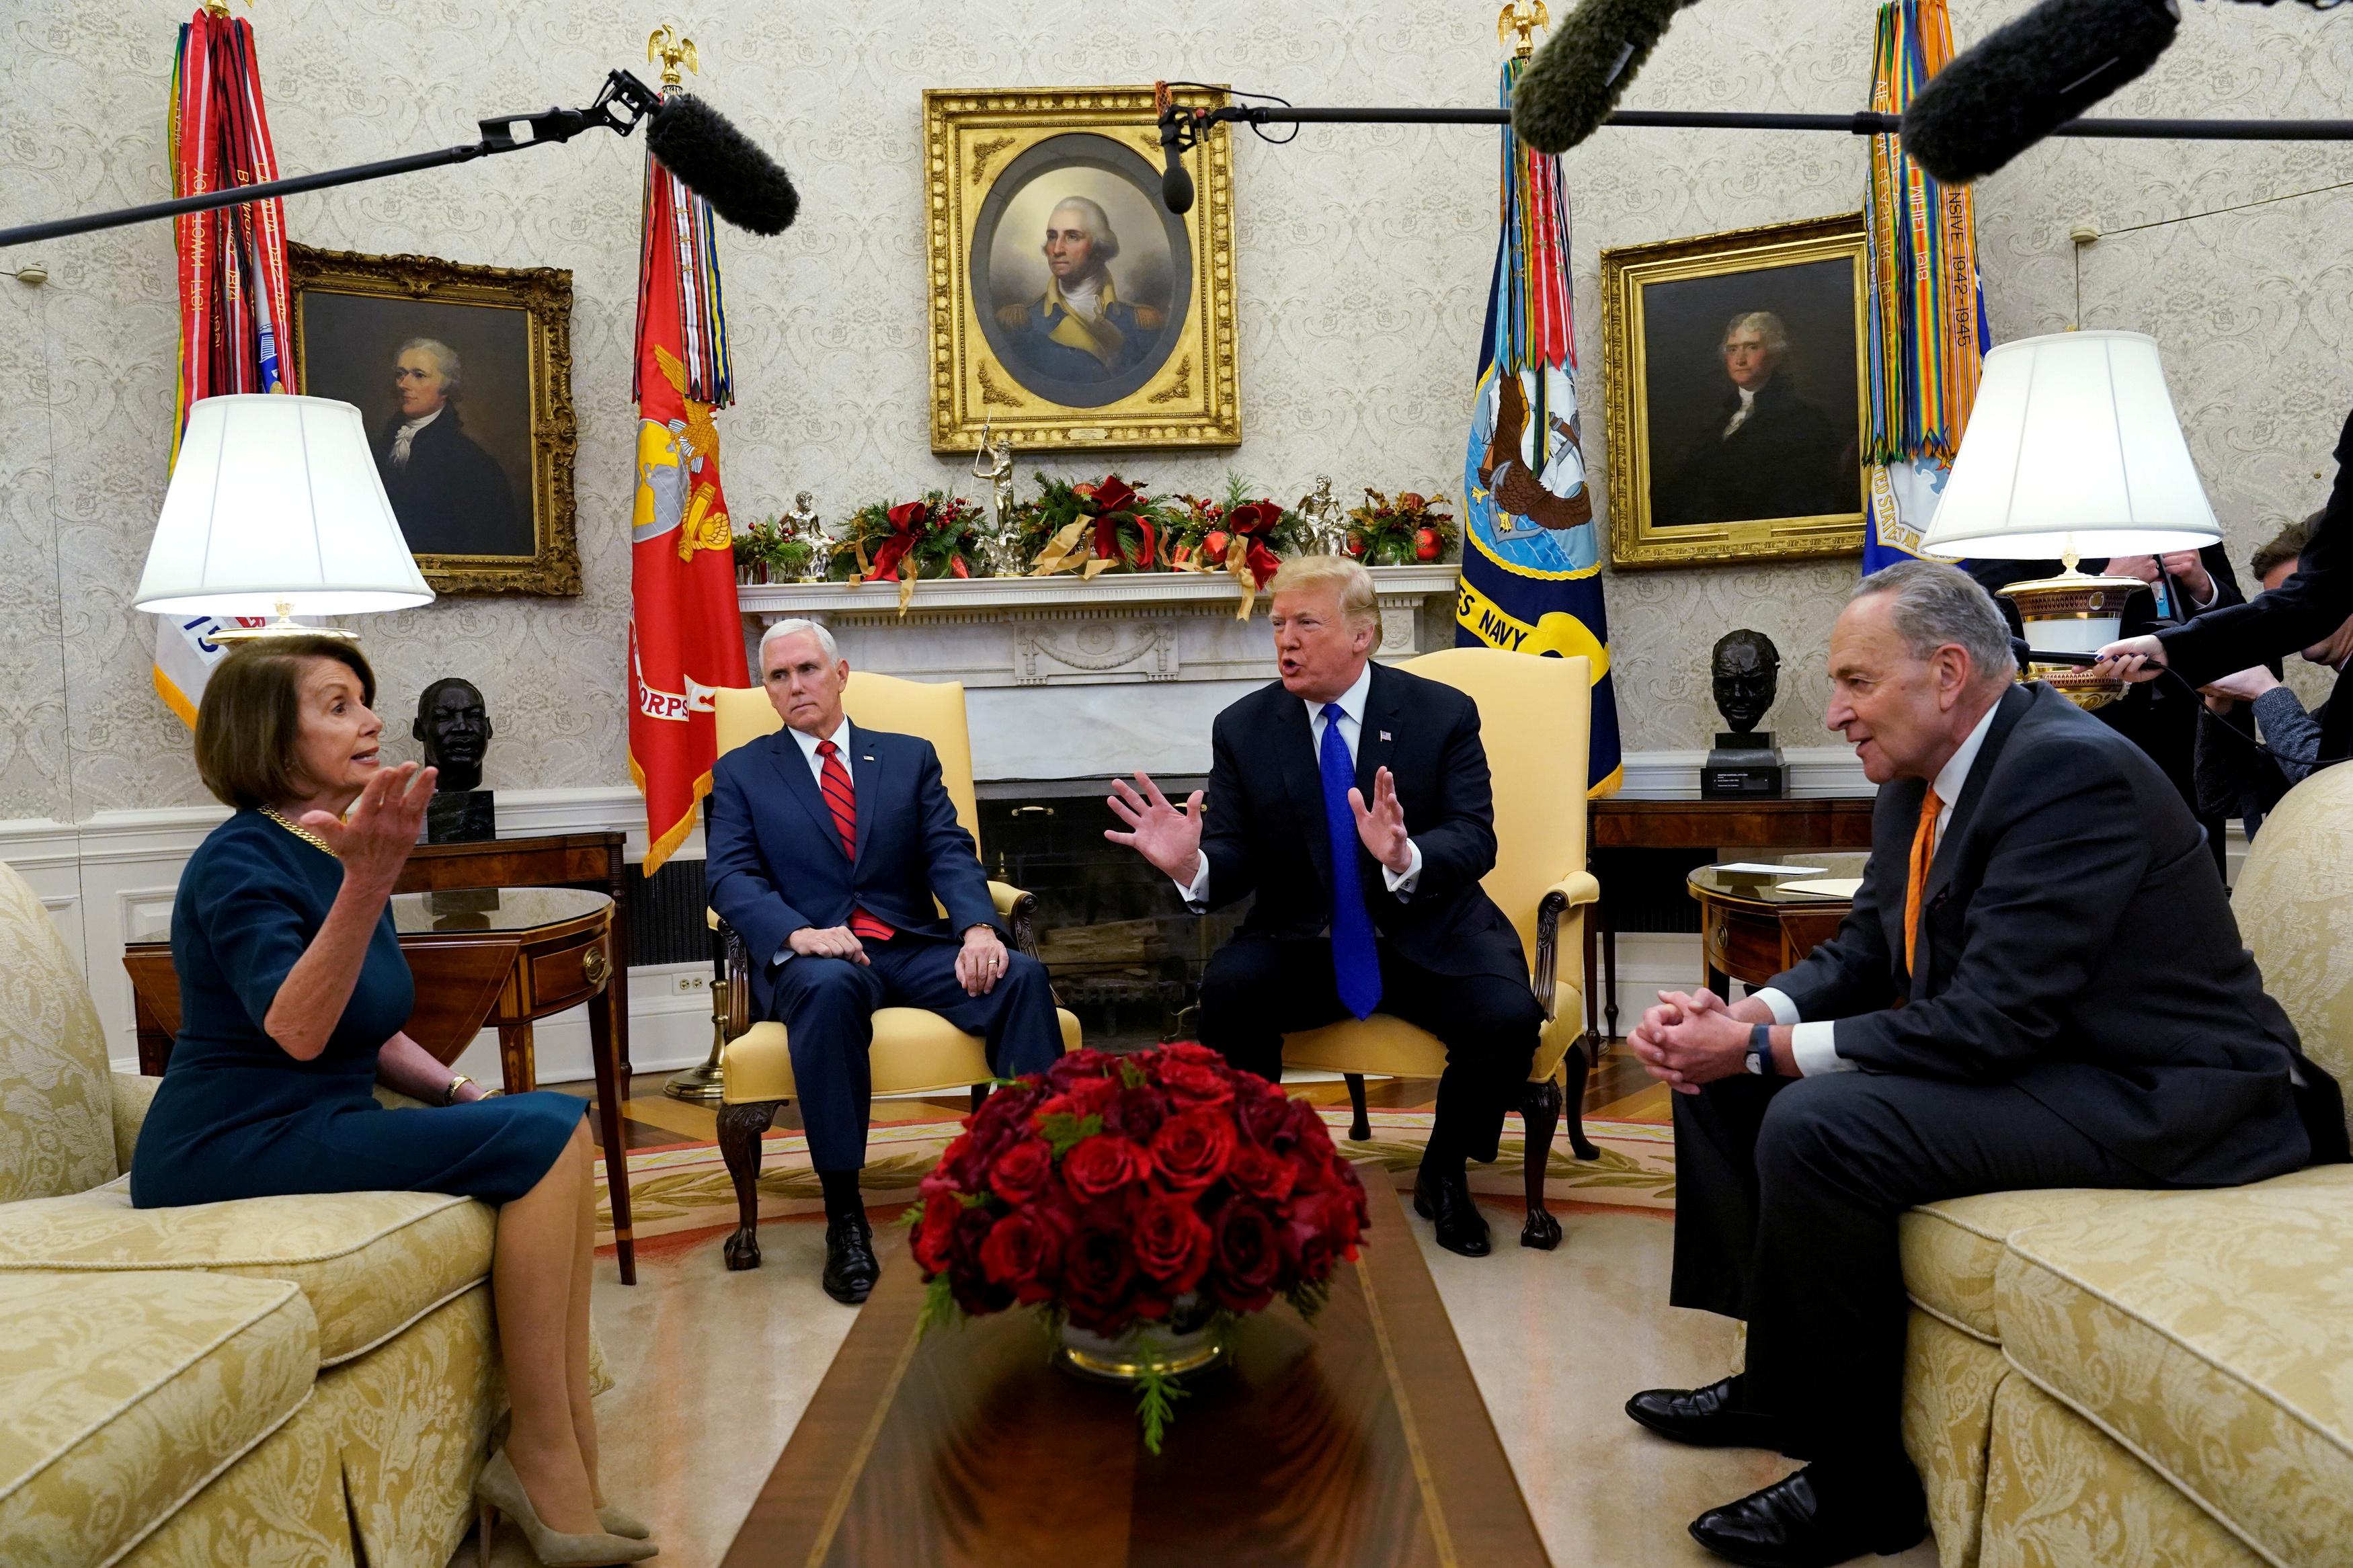 GOP senators meeting with Trump over shutdown